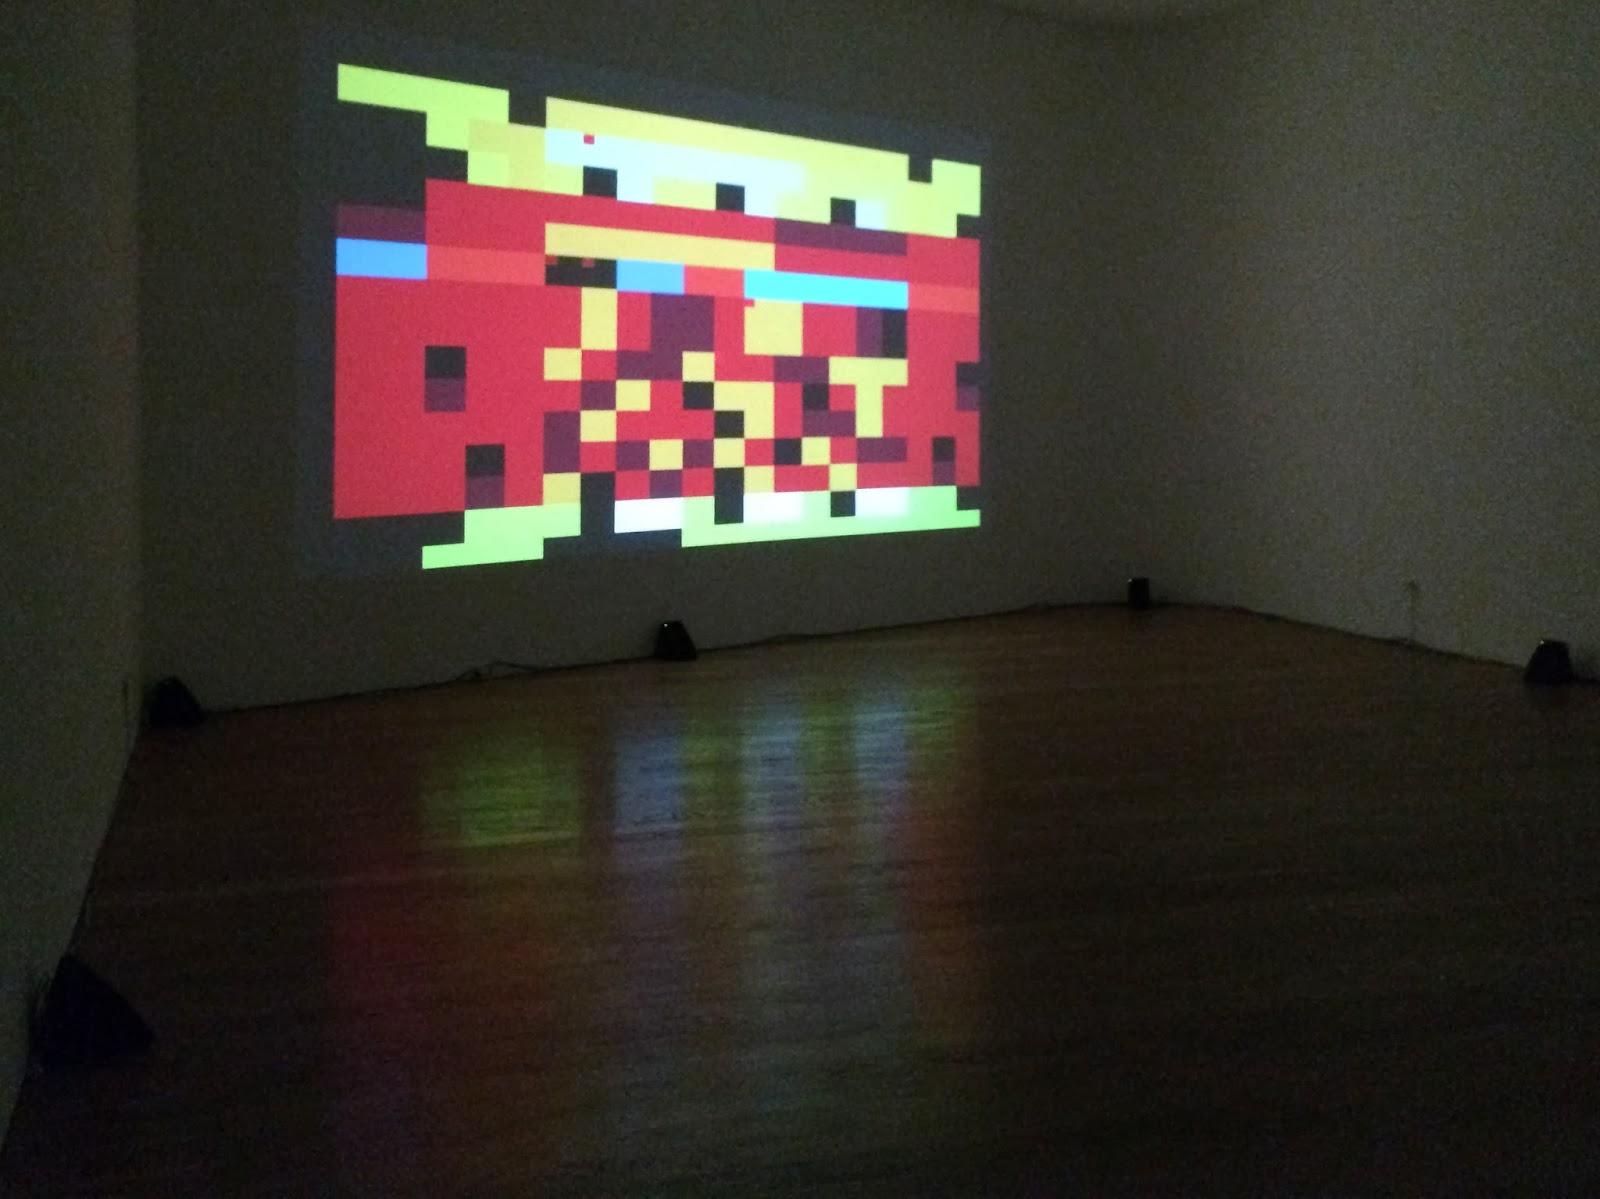 deweys thoughts on symmetry in art